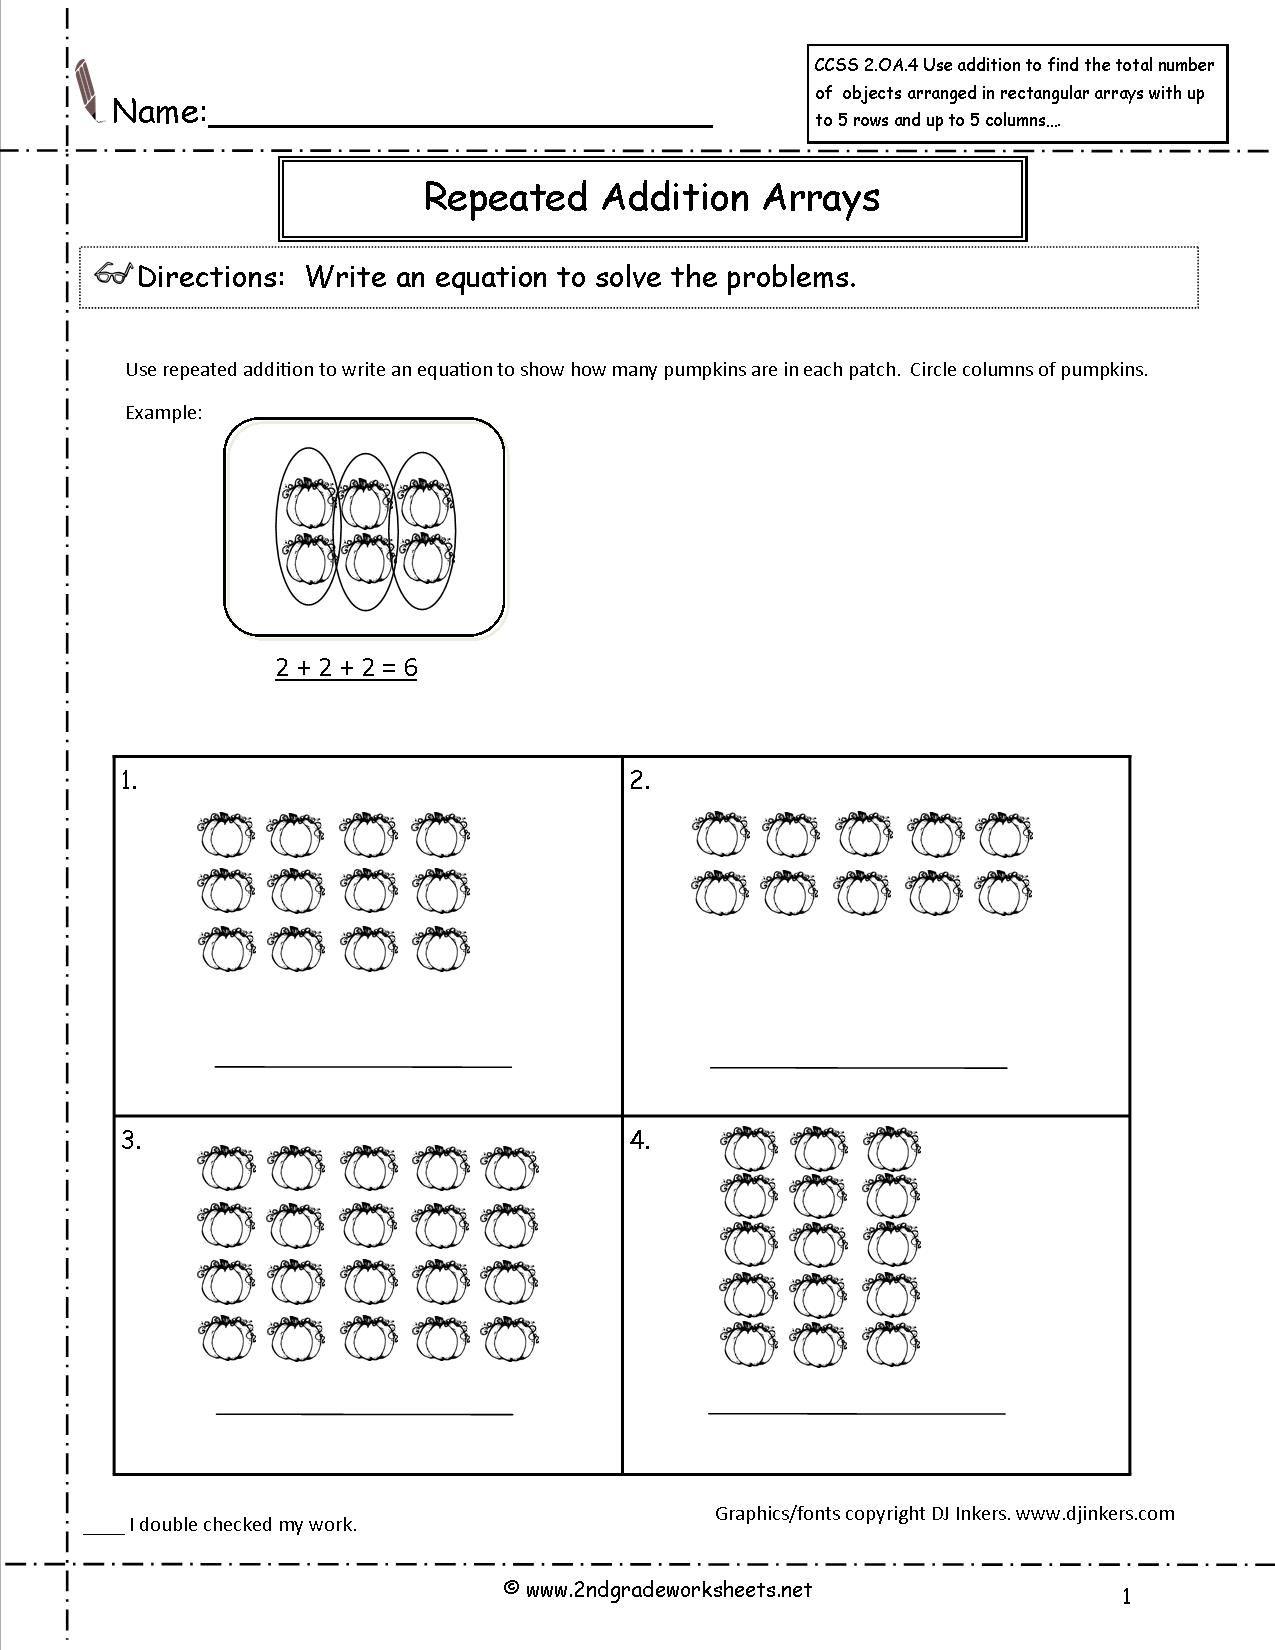 medium resolution of pumpkins repeated addition worksheet   Repeated addition worksheets